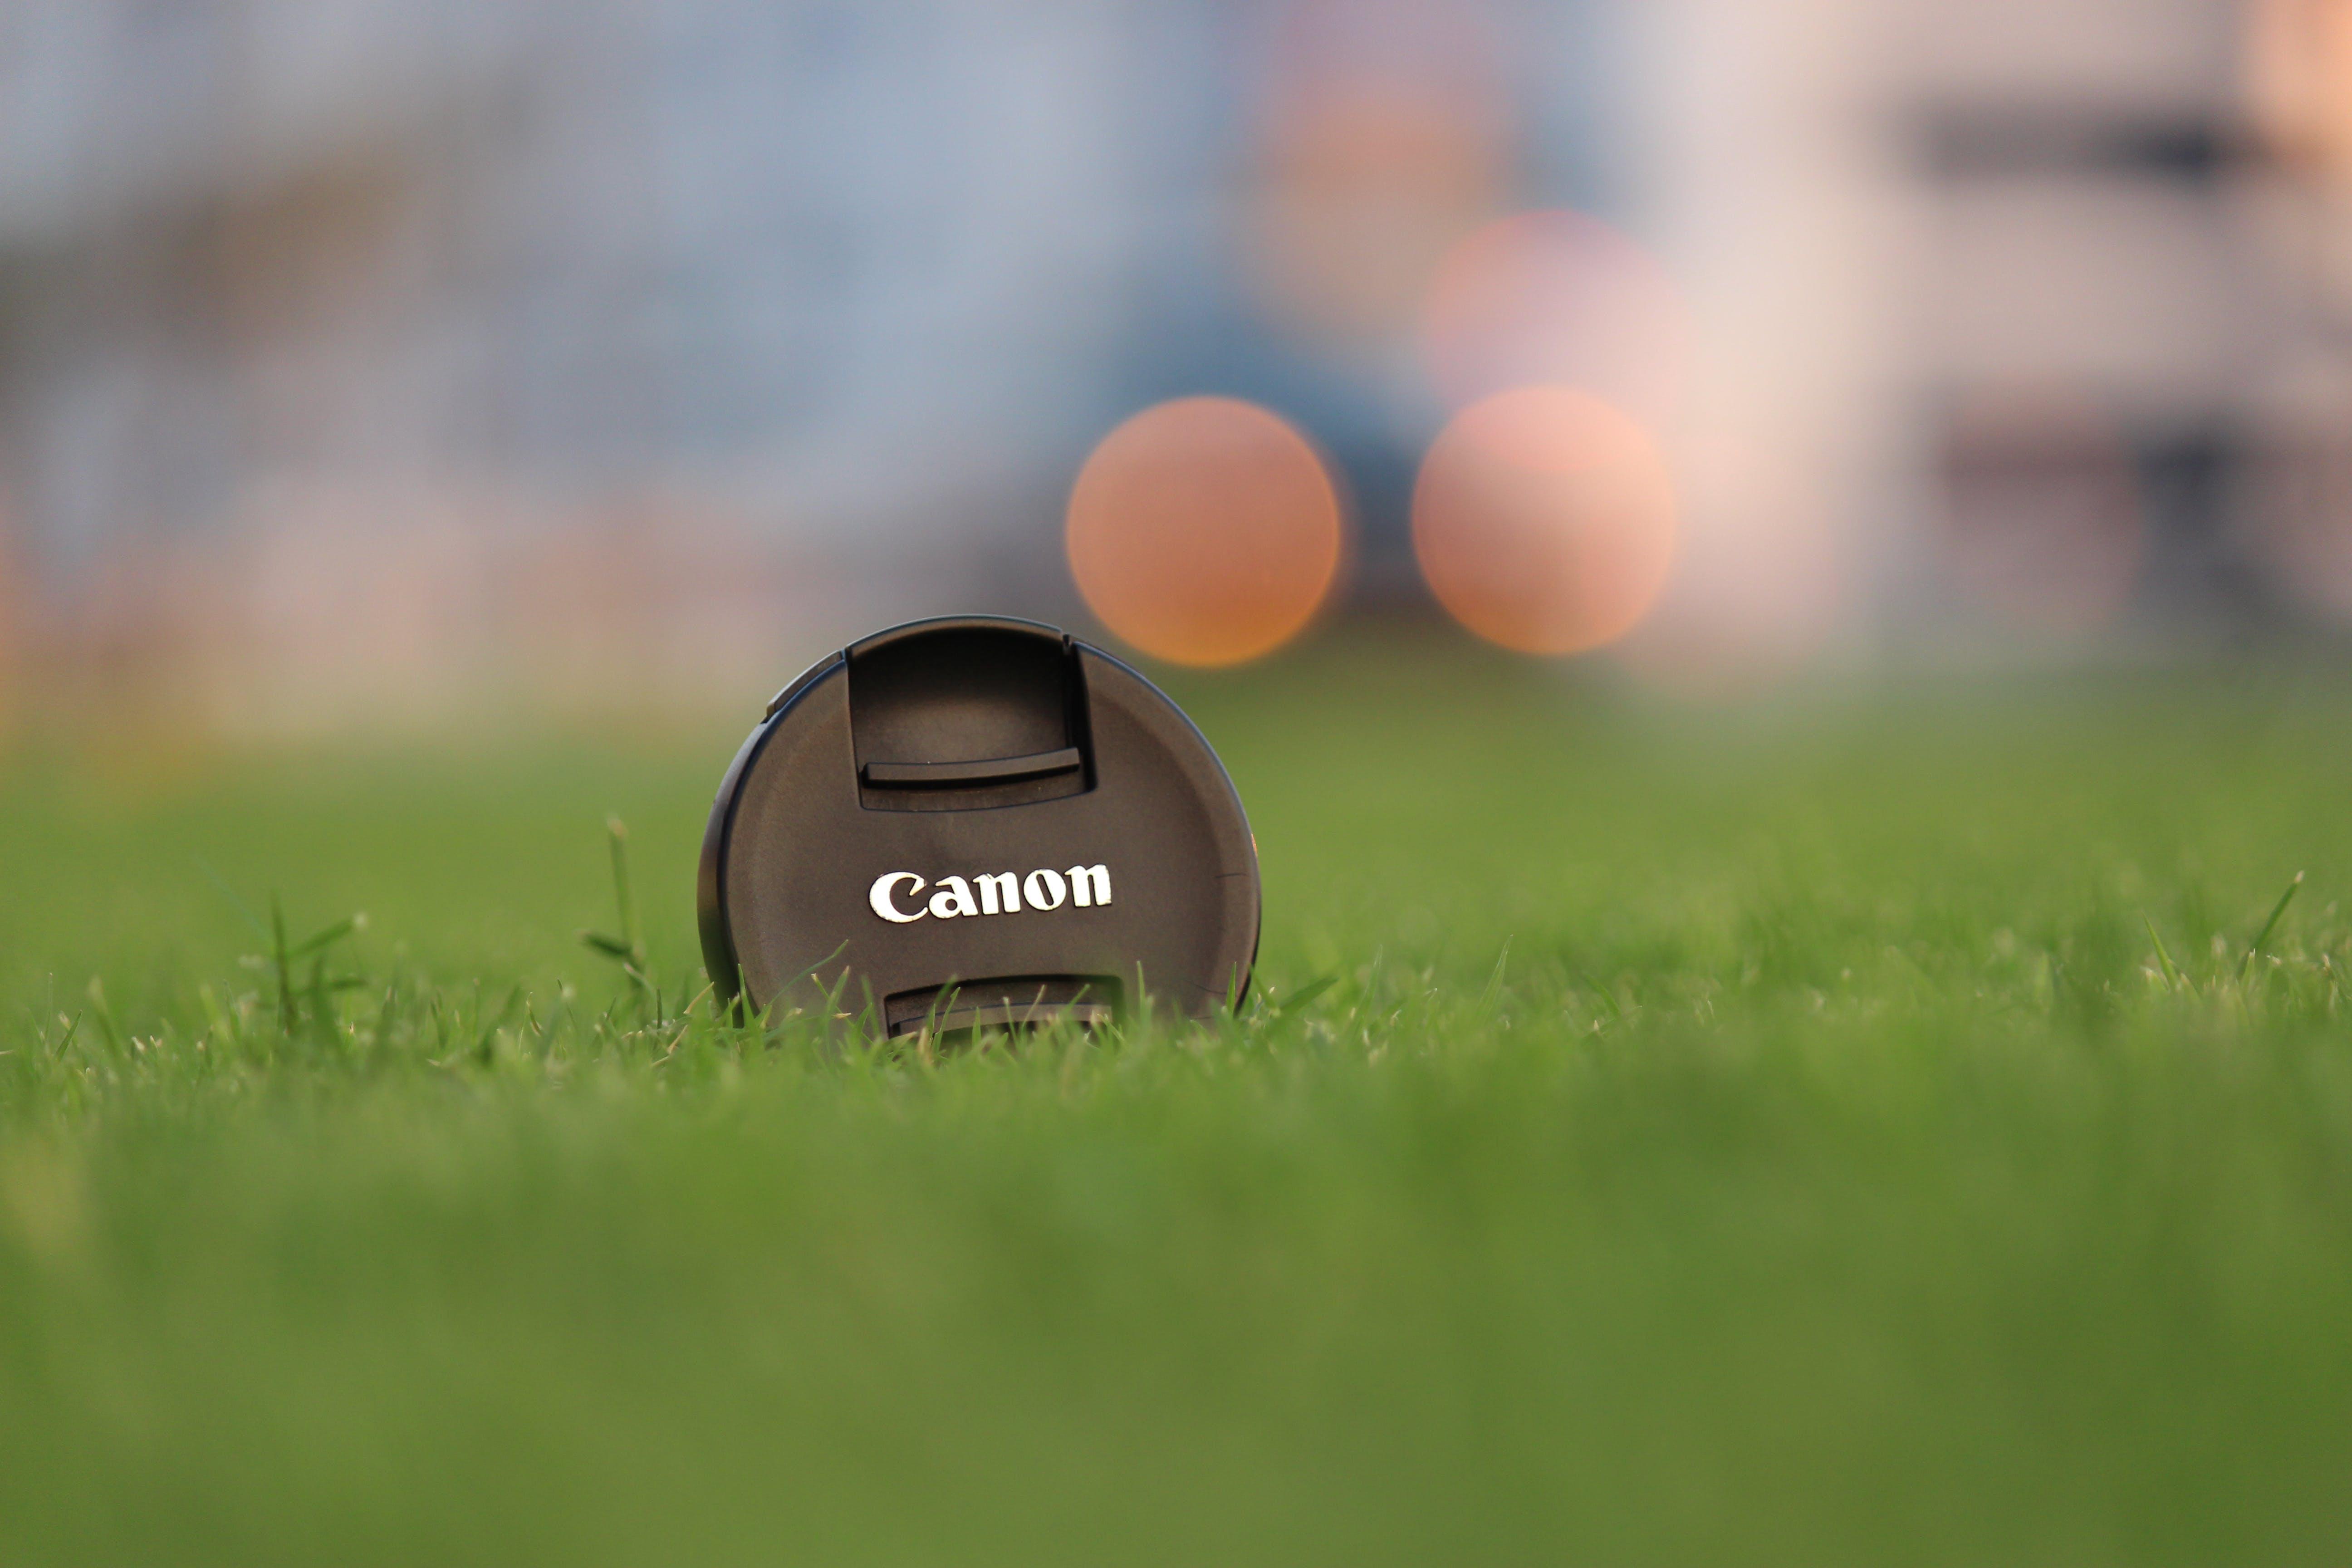 Free stock photo of Adobe Photoshop, canon, dubai, high speed photography